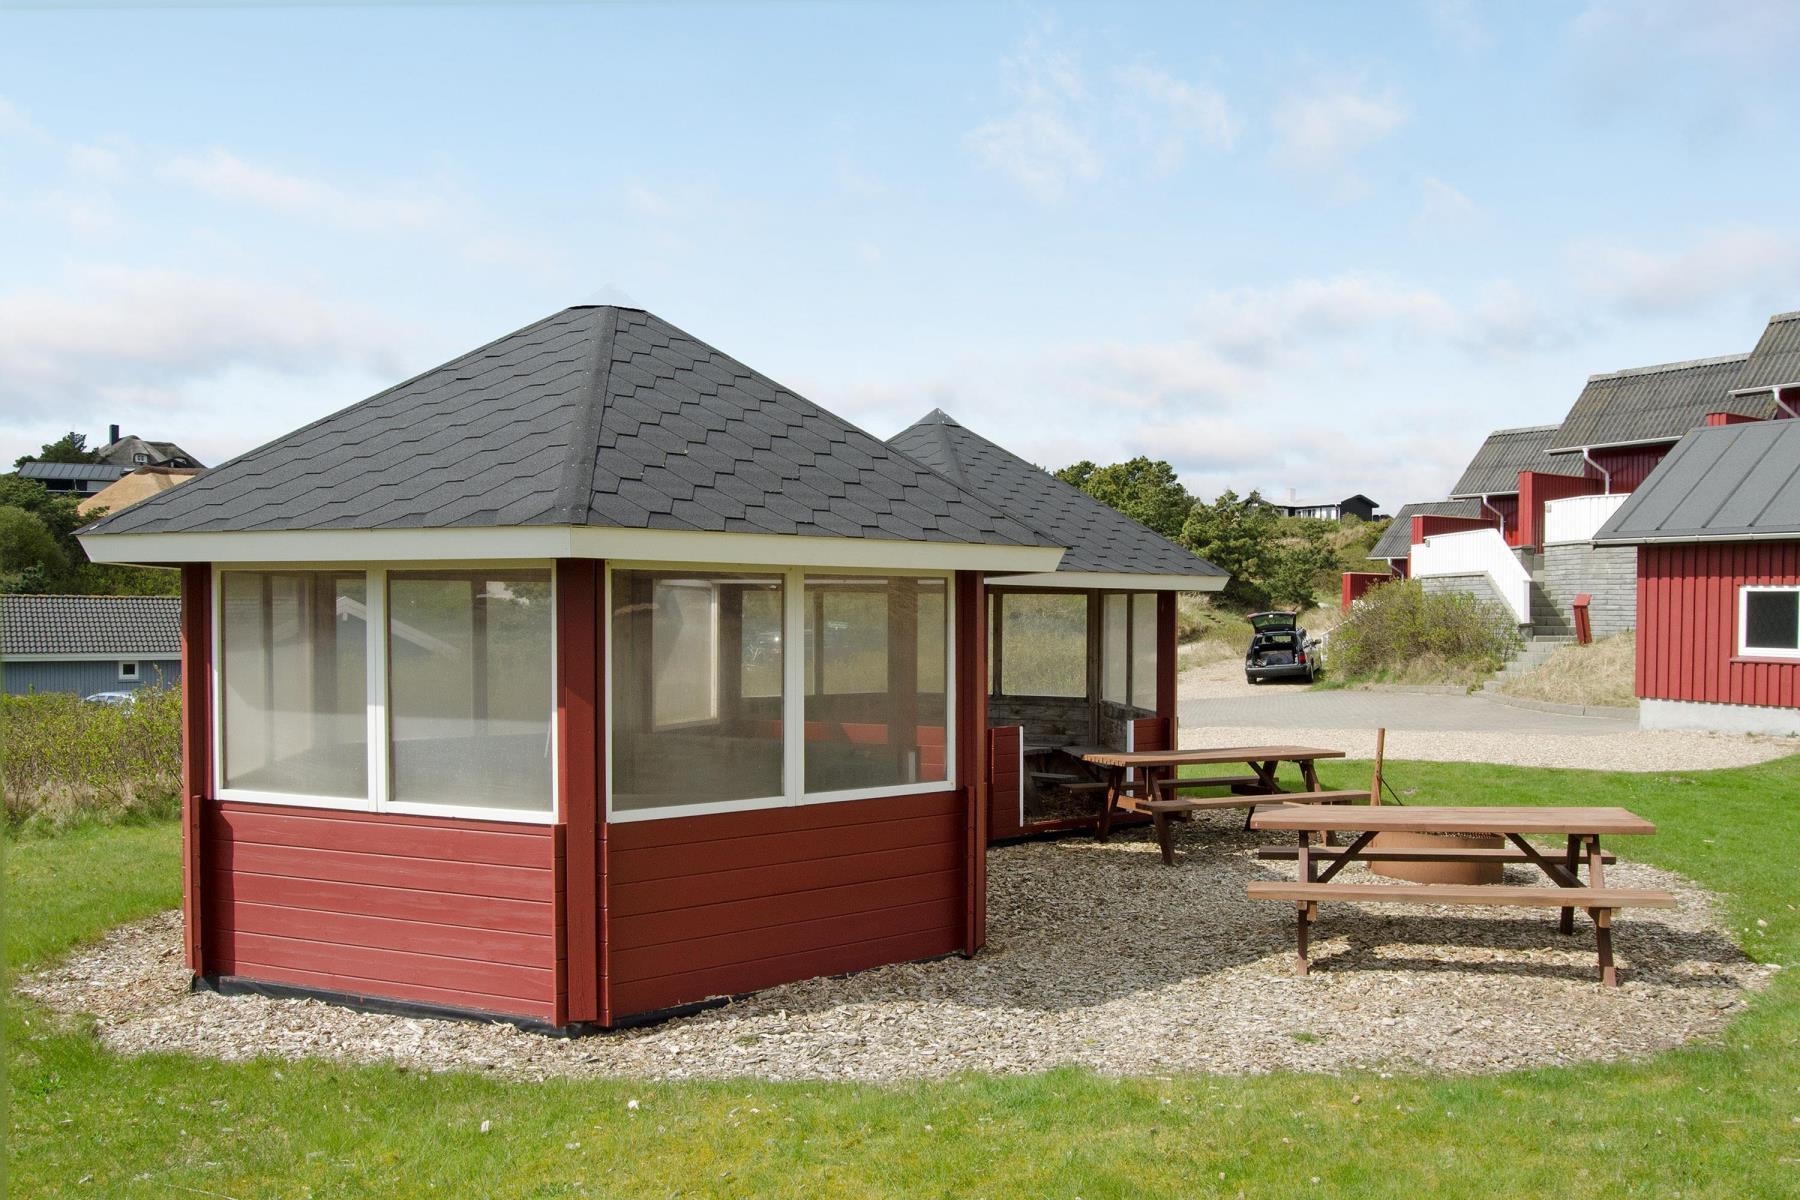 Ferienhaus 1004 - Hjelmevej 15, App. 4